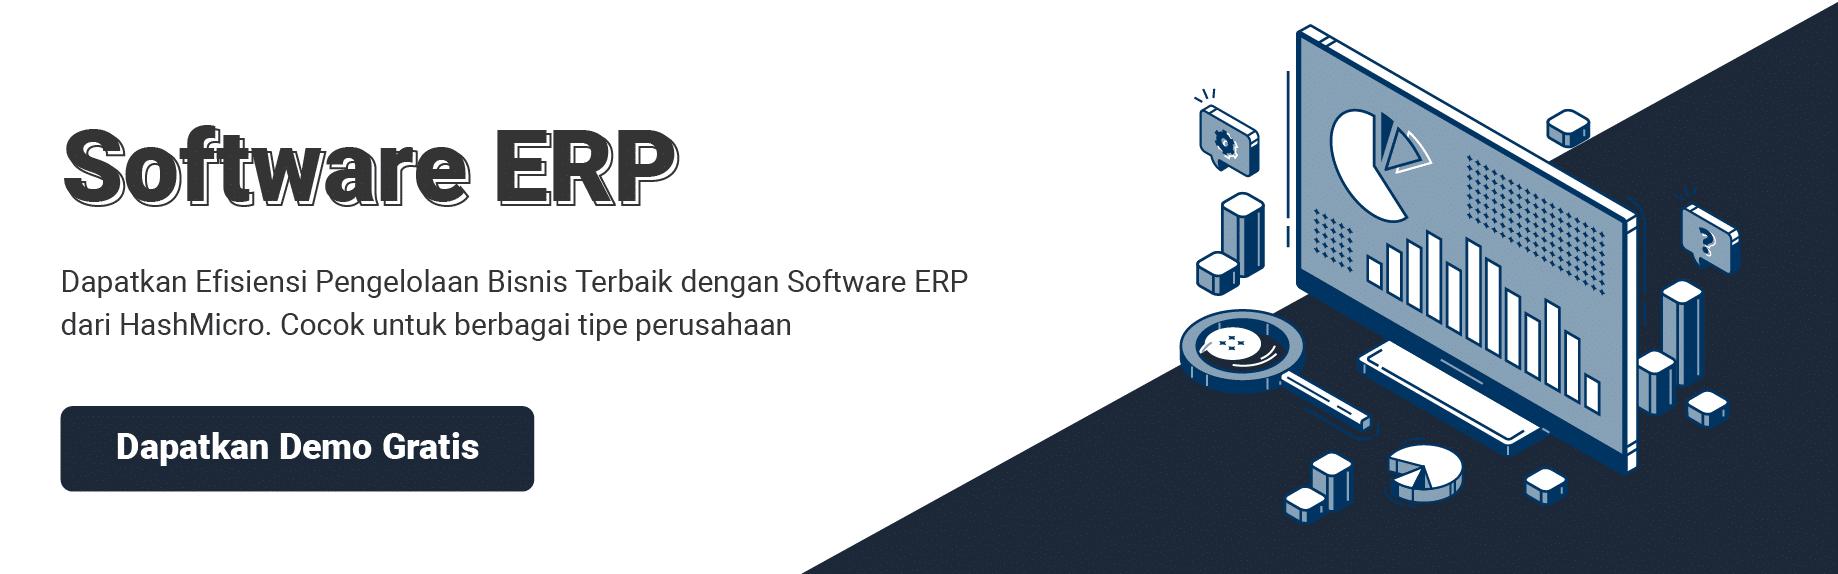 Software ERP HashMicro | Pangsa pasar adalah